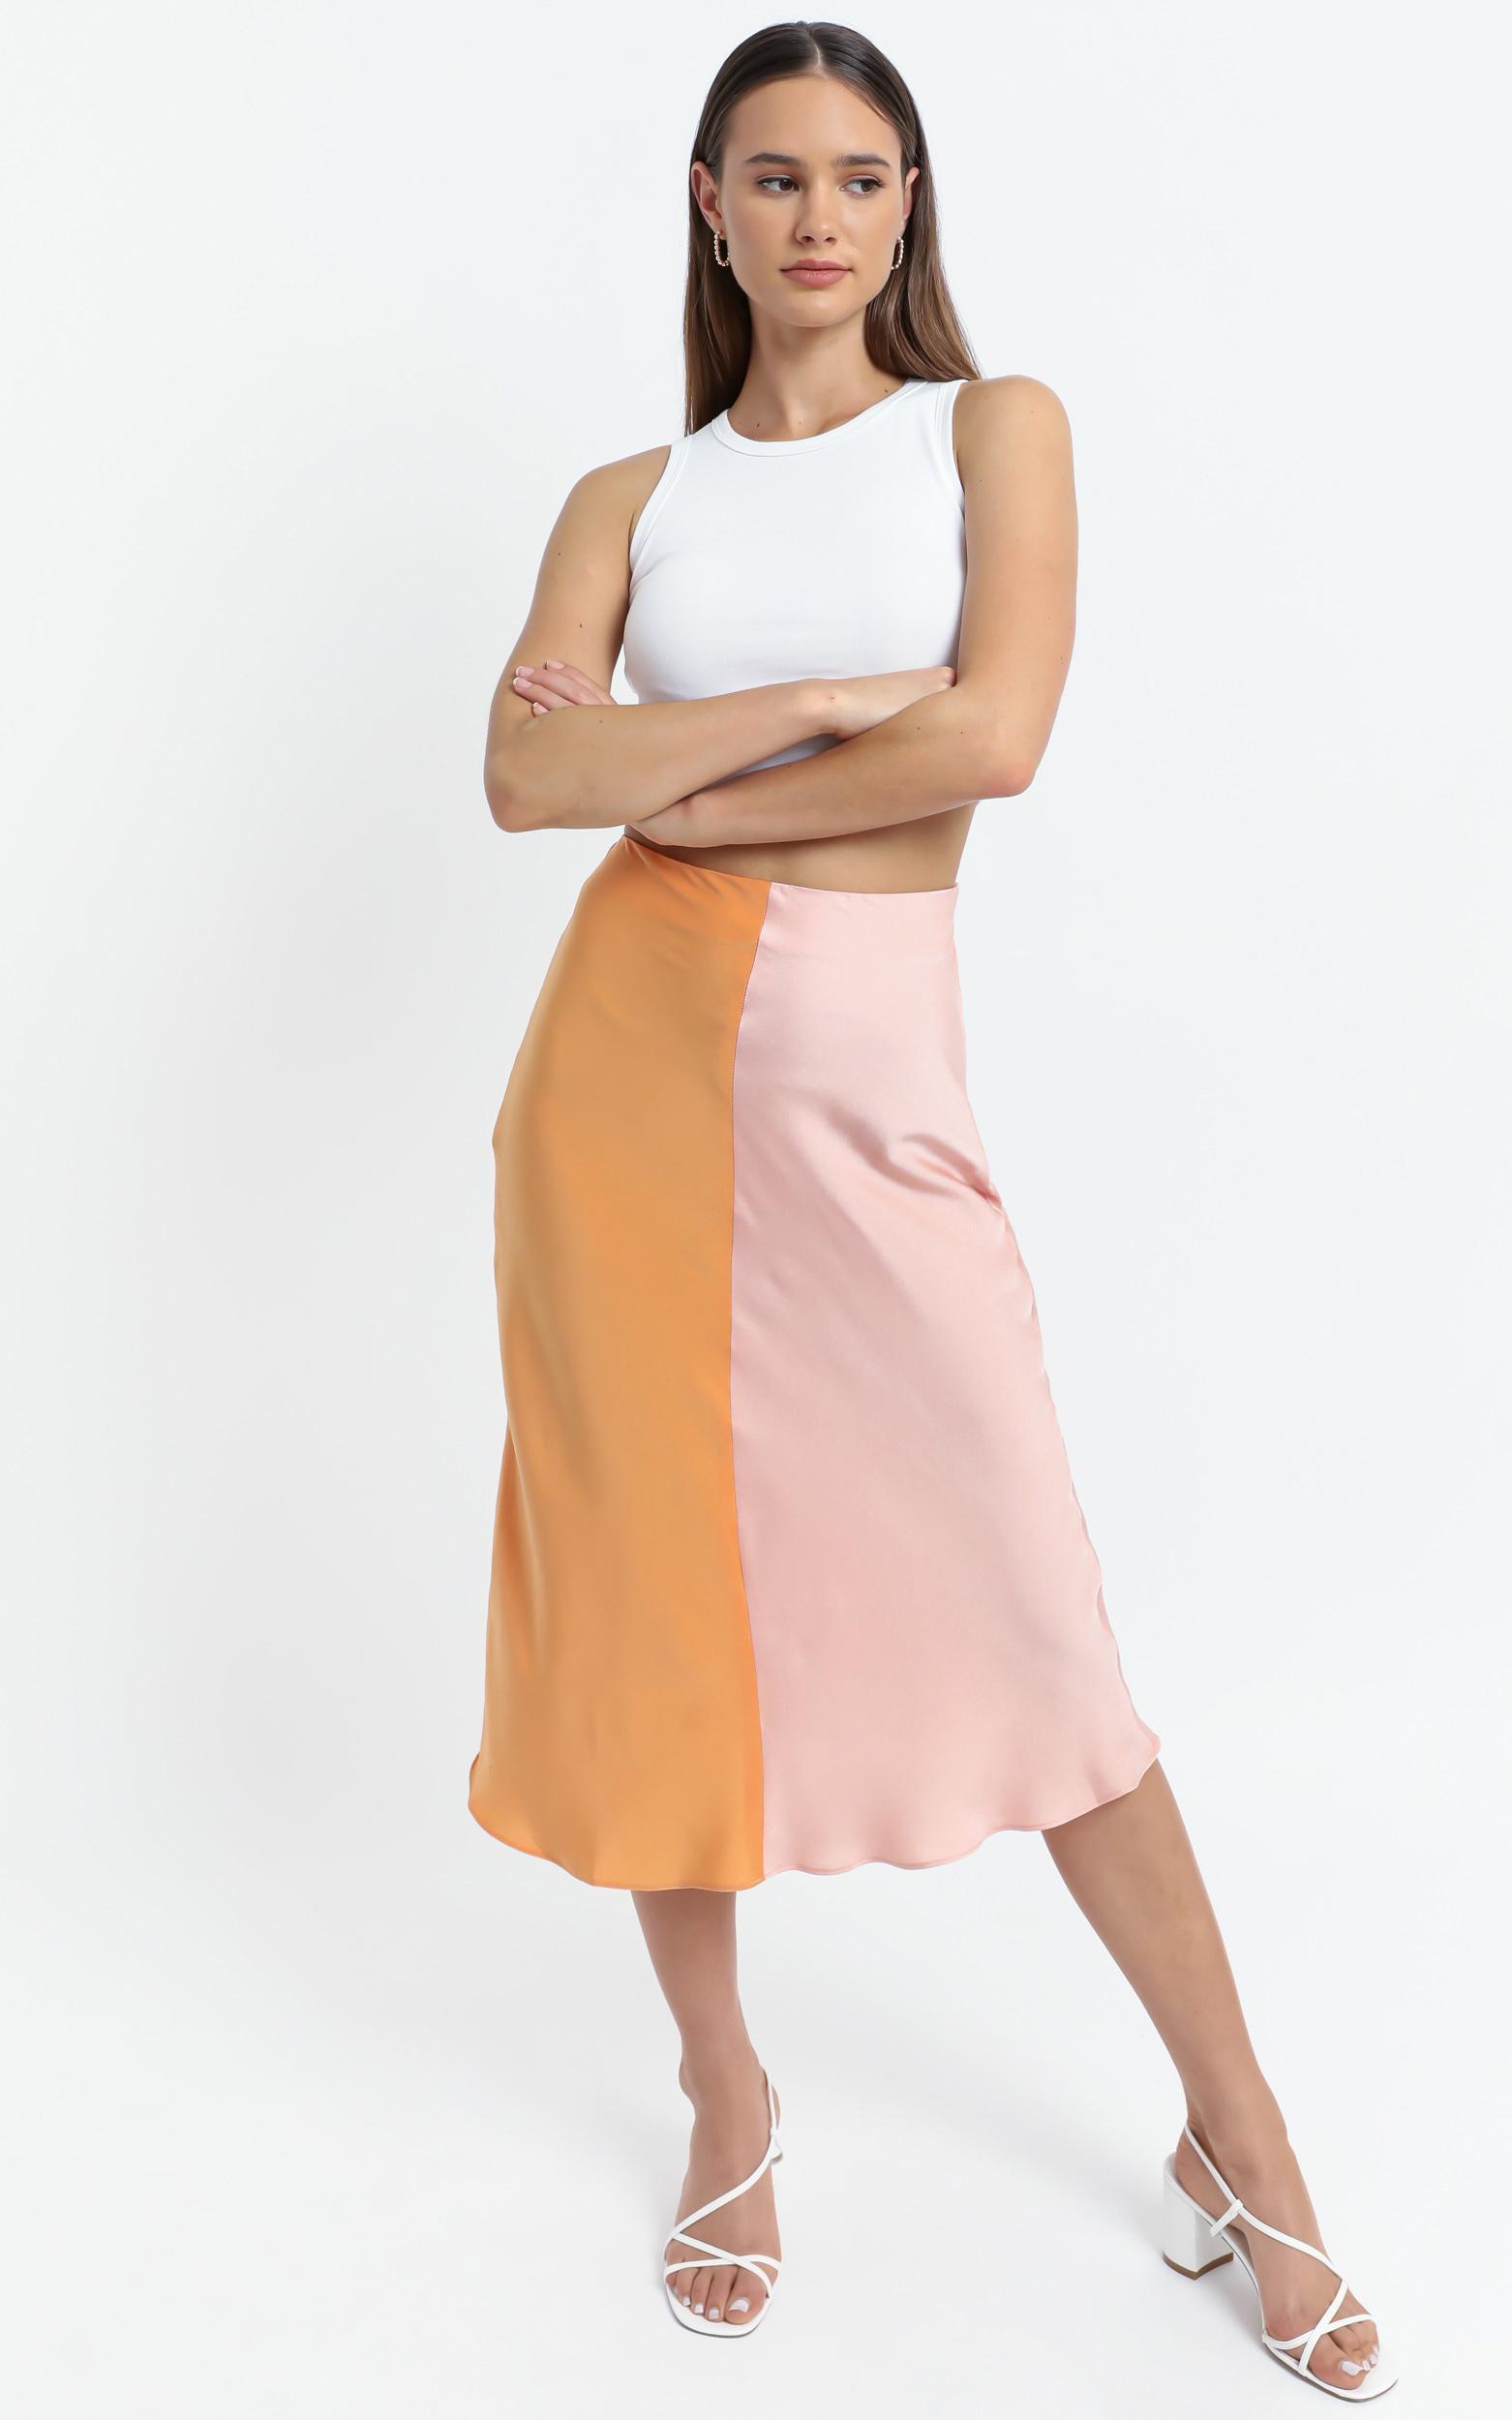 Addington Skirt in Pink and Orange - 6 (XS), Pink, hi-res image number null